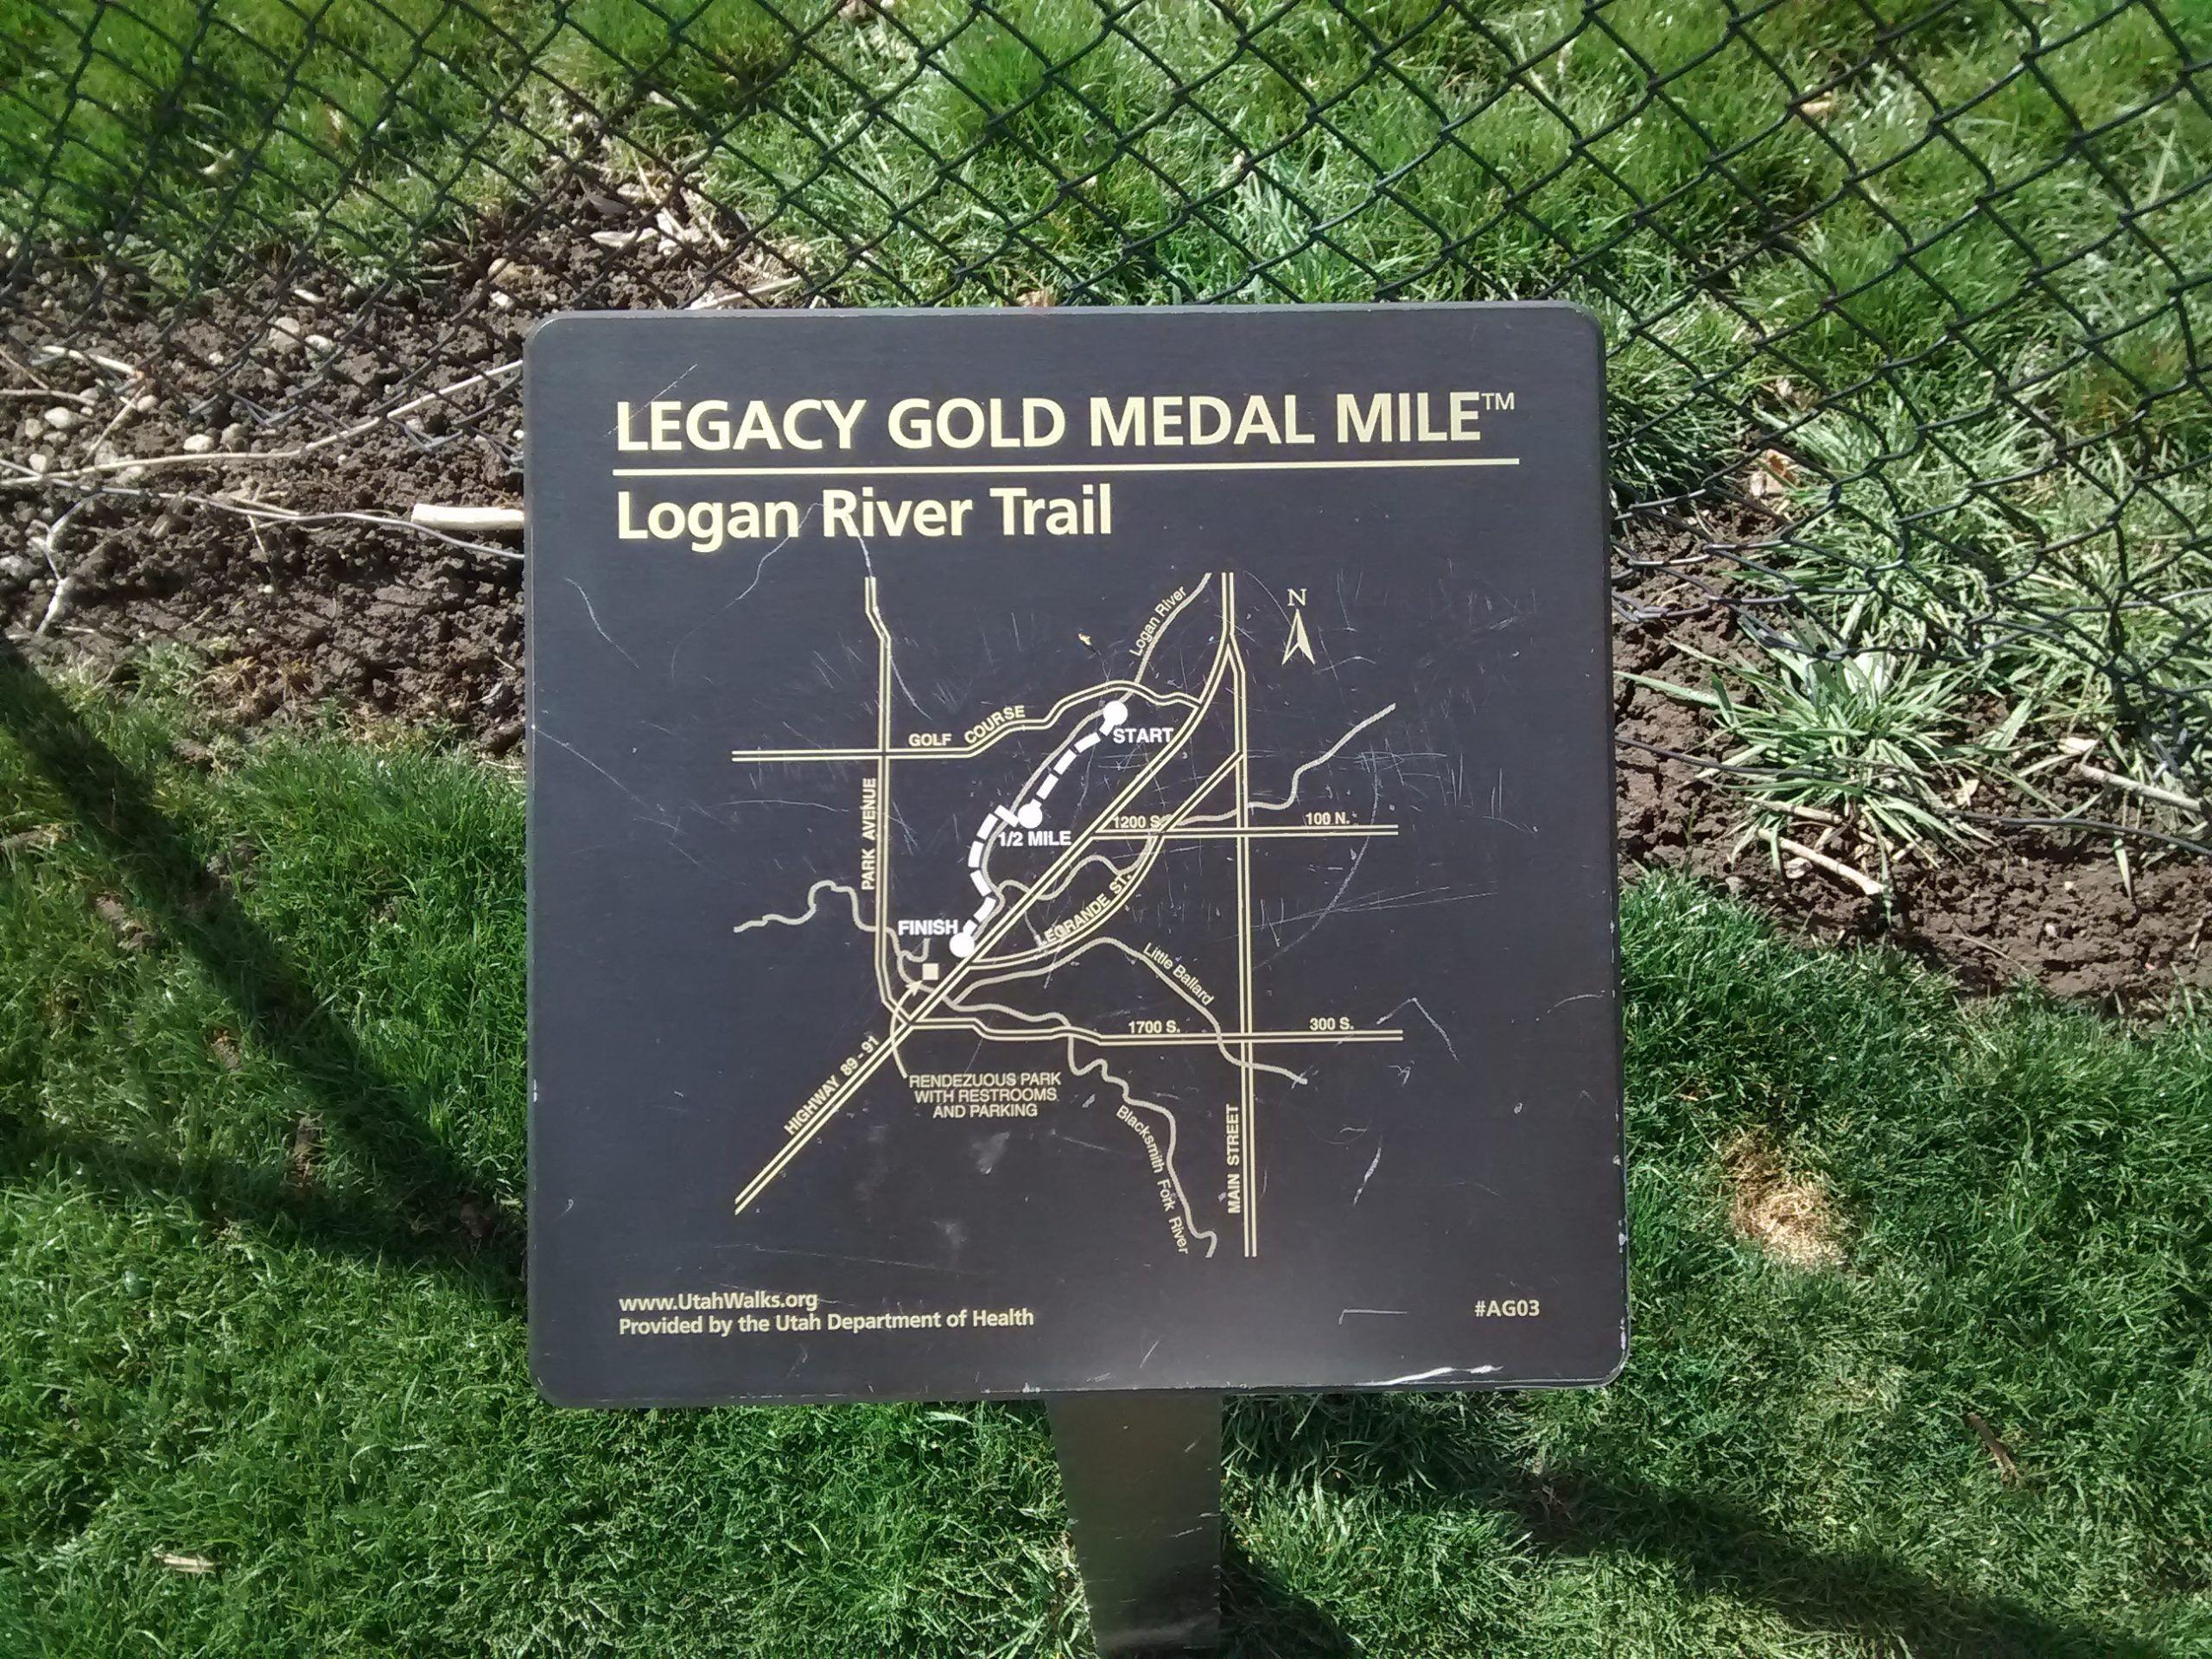 Logan River Trail Map